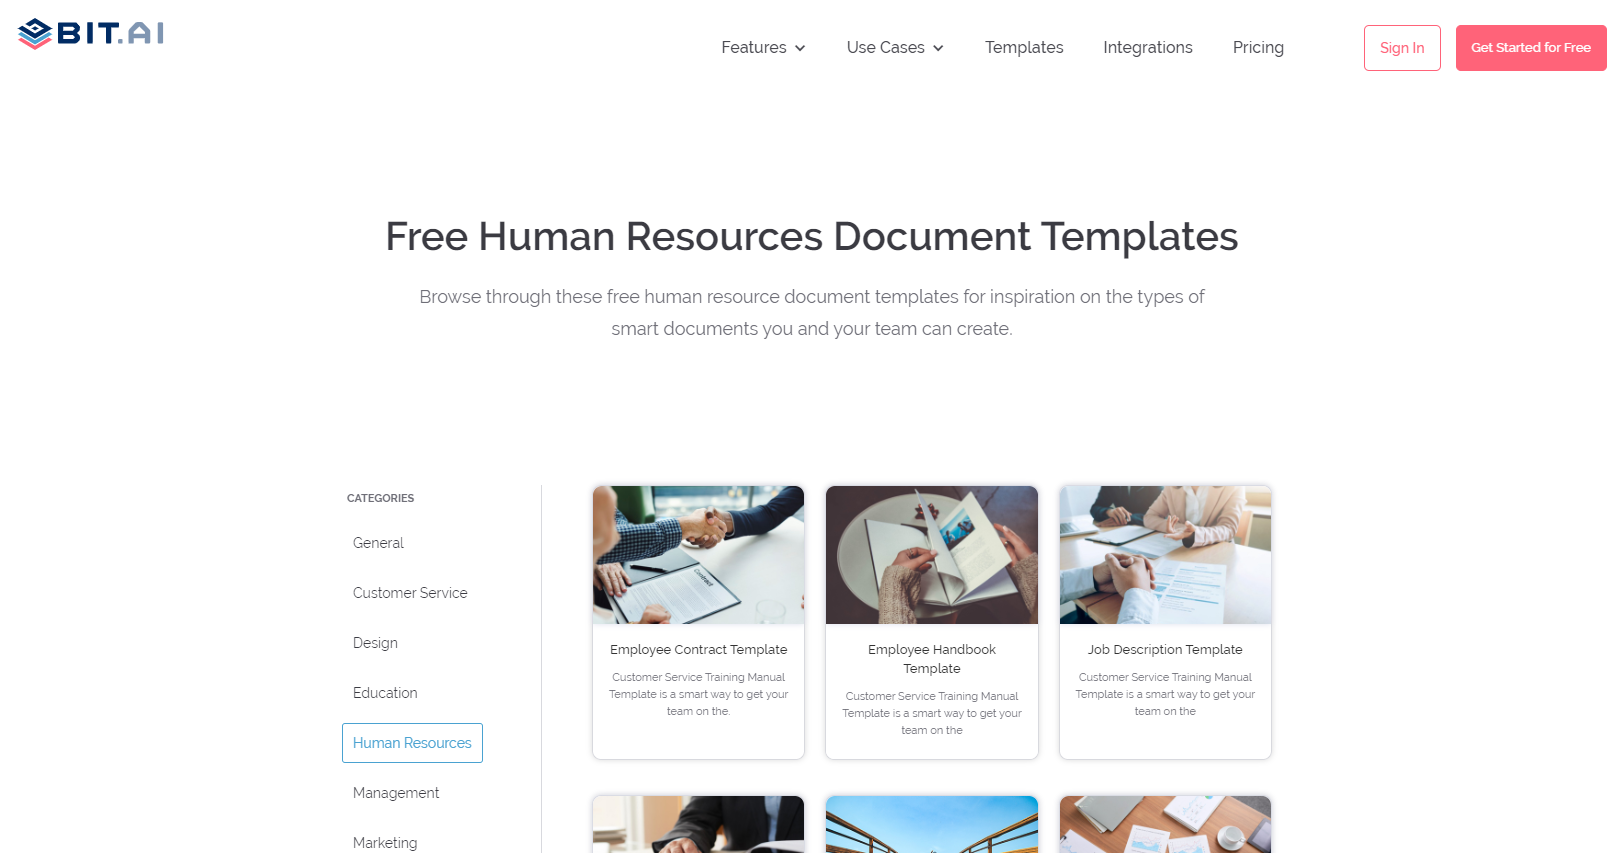 Resource Manual Template from uploads-ssl.webflow.com